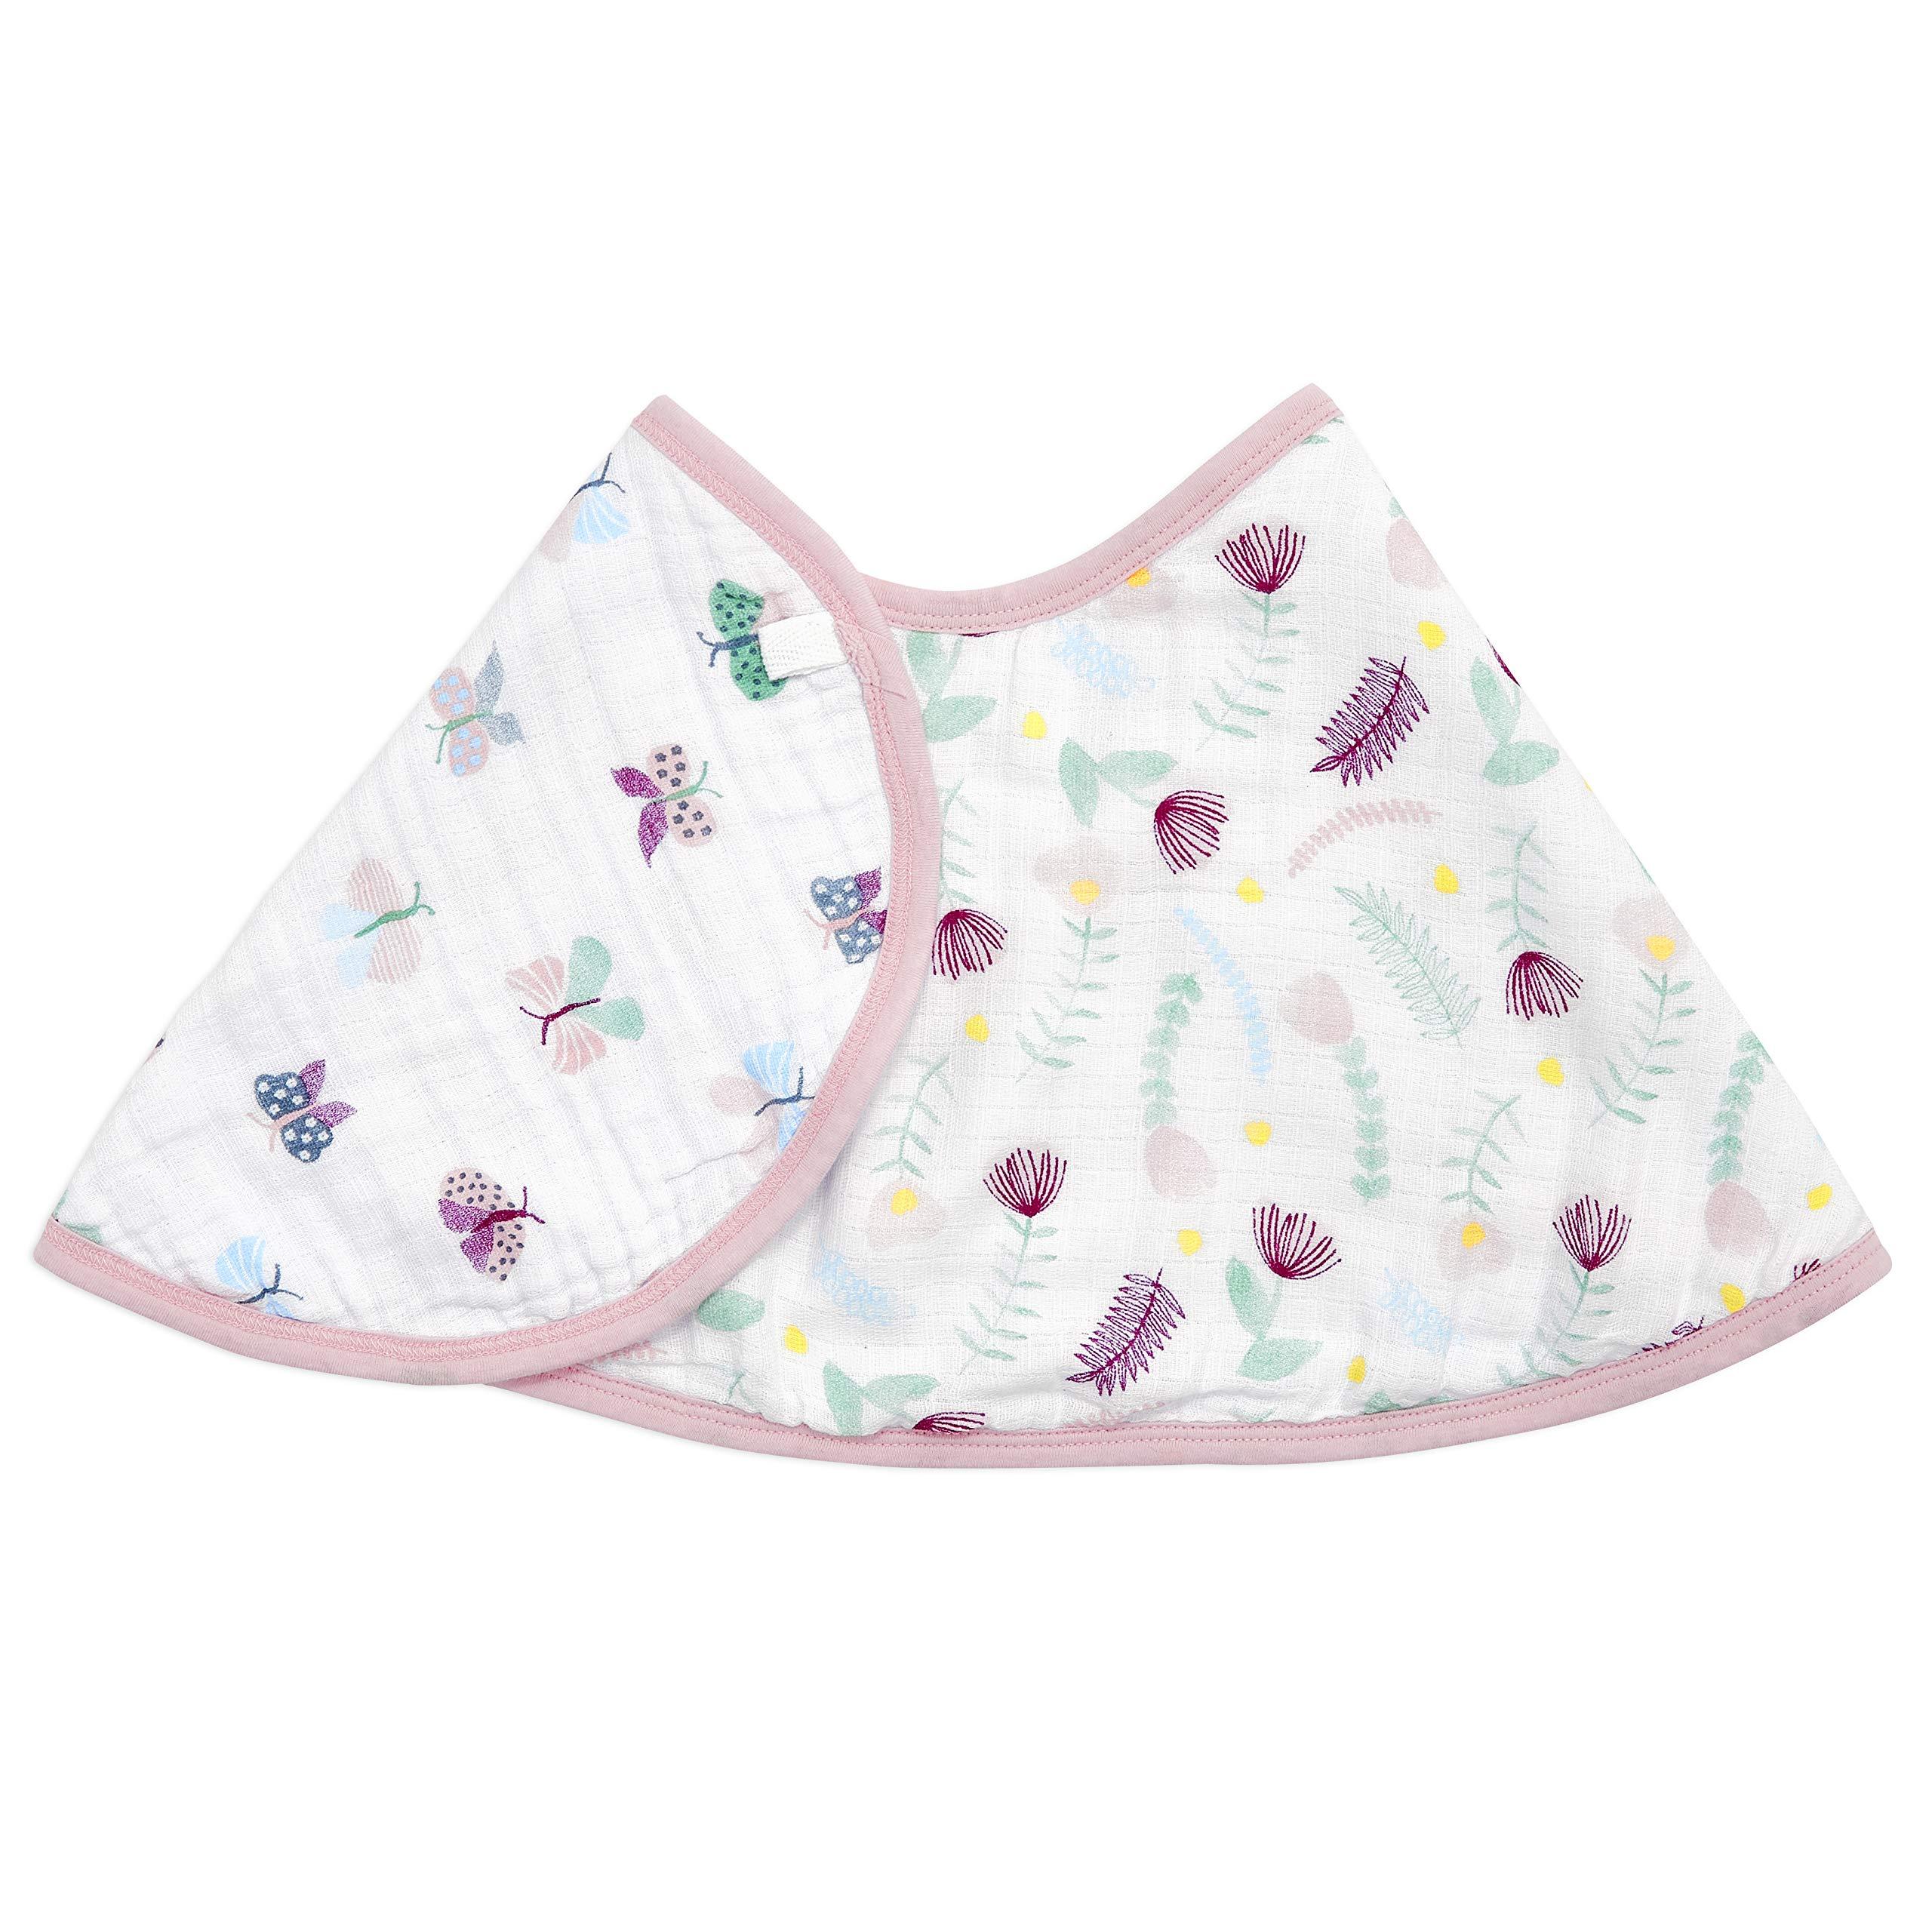 "aden + anais Burpy Baby Bib, 100% Cotton Muslin, Soft Absorbent 4 Layers, Multi-Use Burp Cloth and Bib, 22.5"" X 11"", Single, Floral Fauna"